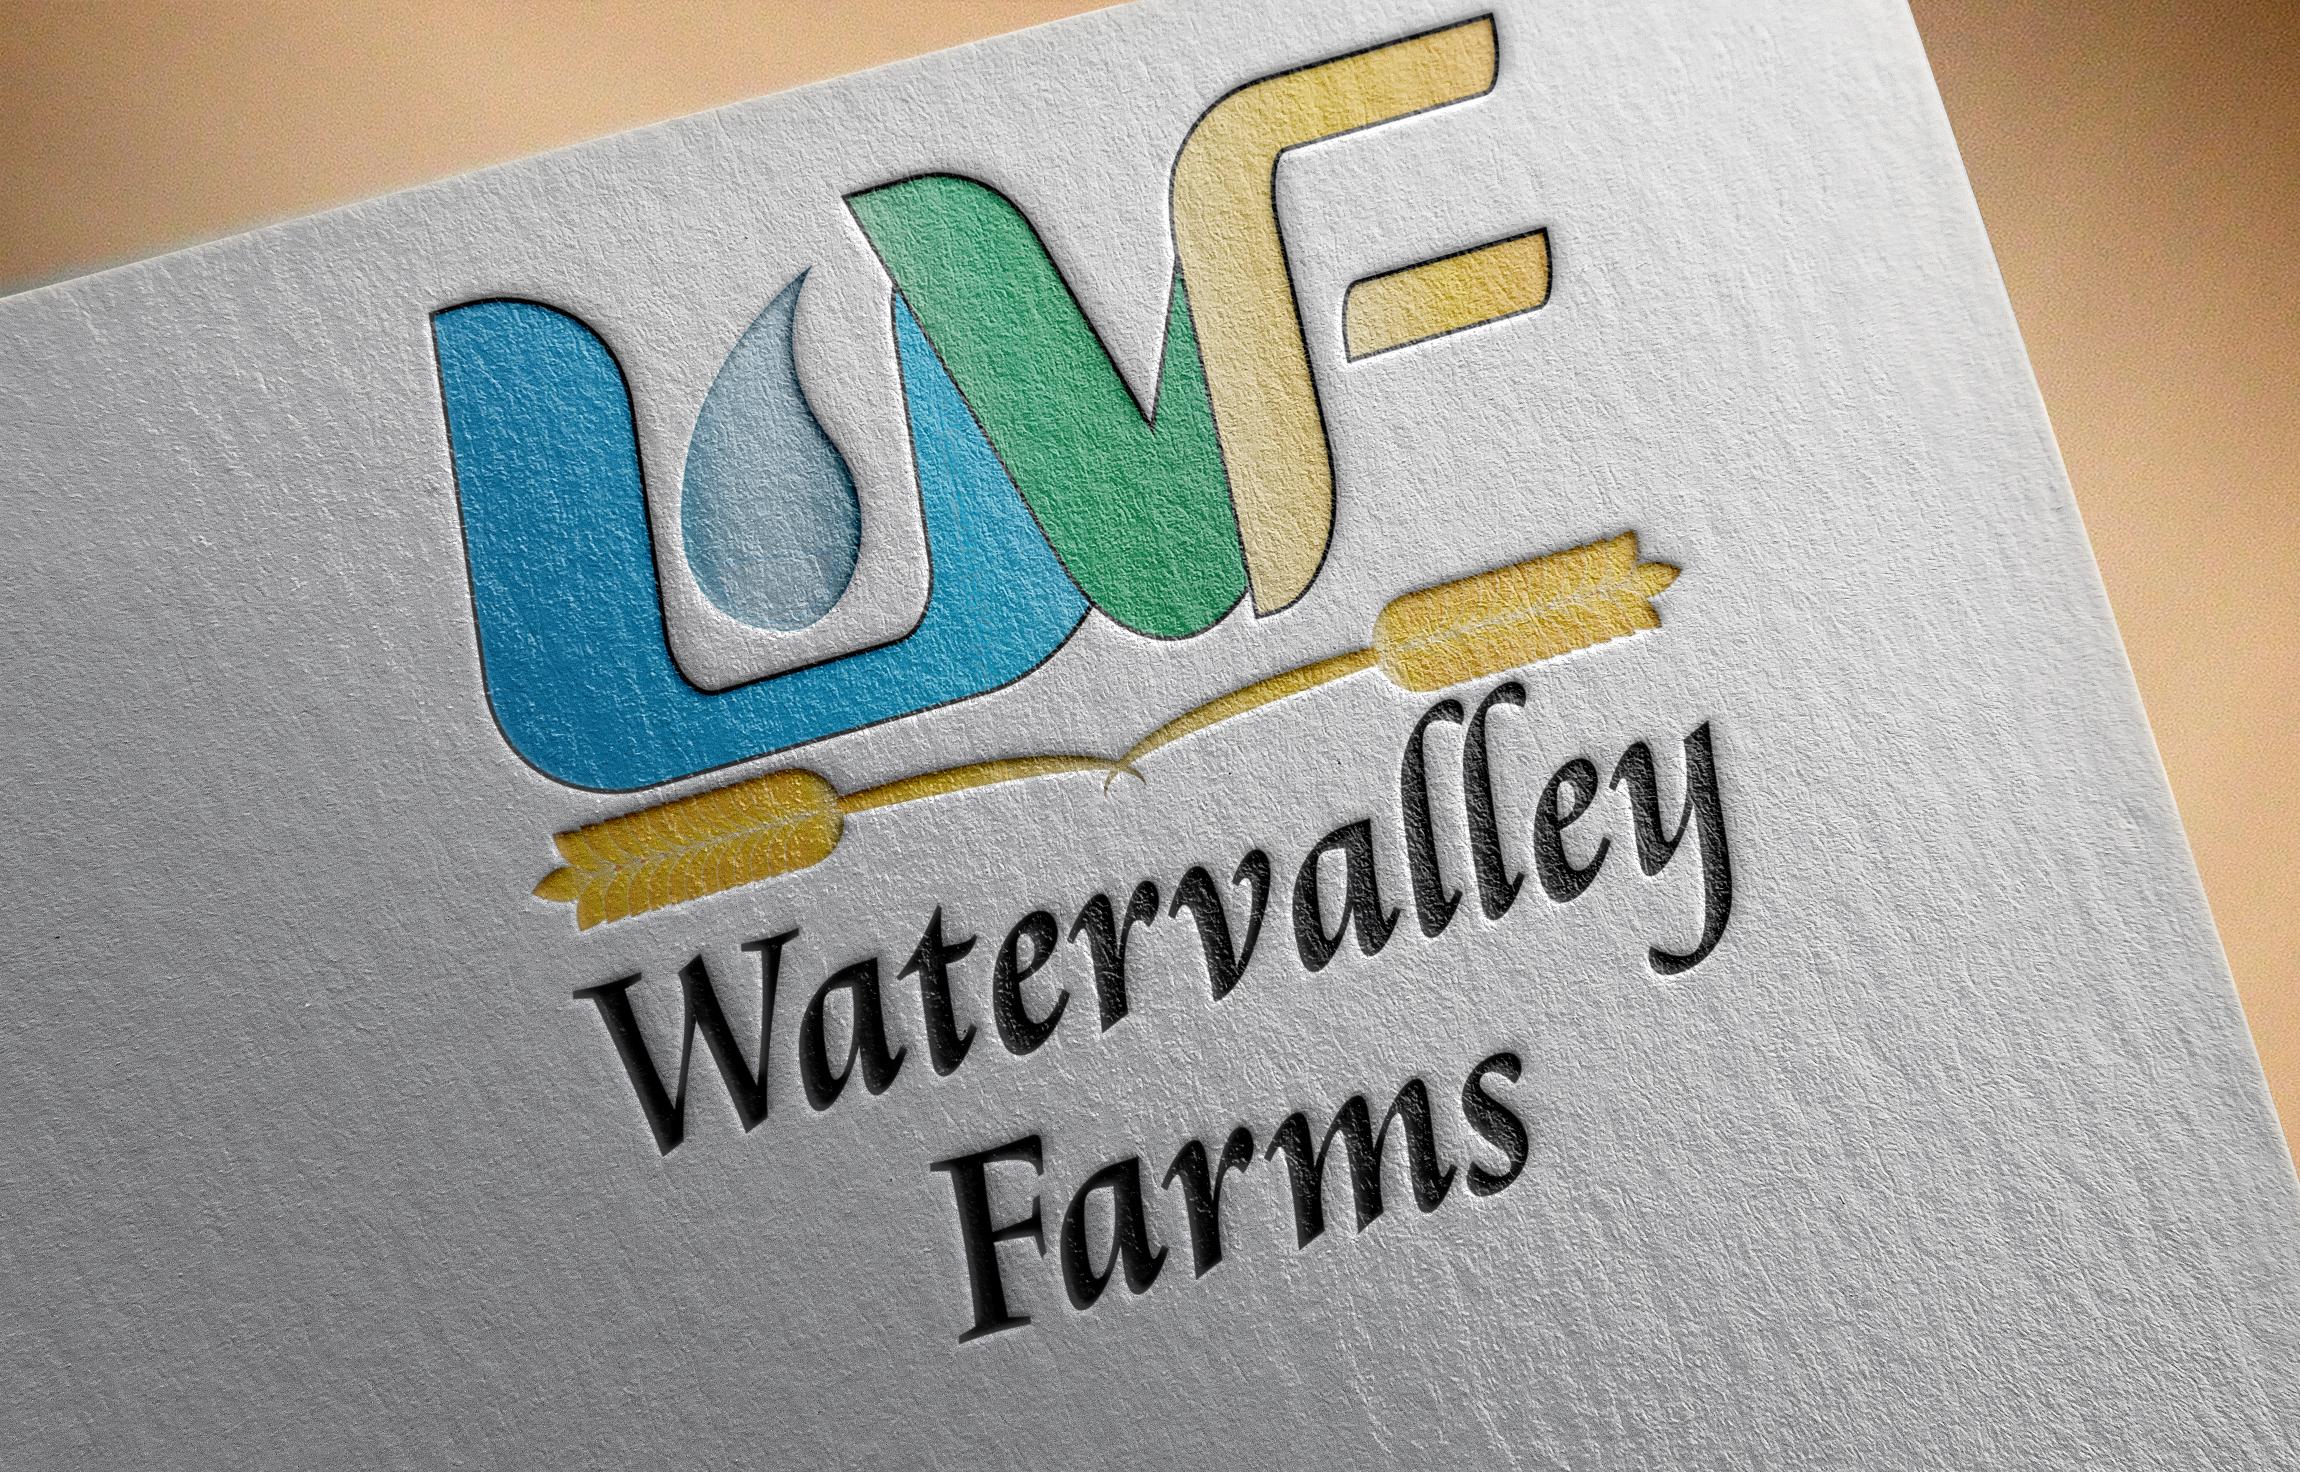 Logo Design by Goran Ledjenovic - Entry No. 104 in the Logo Design Contest New Logo Design for Watervalley Farms.